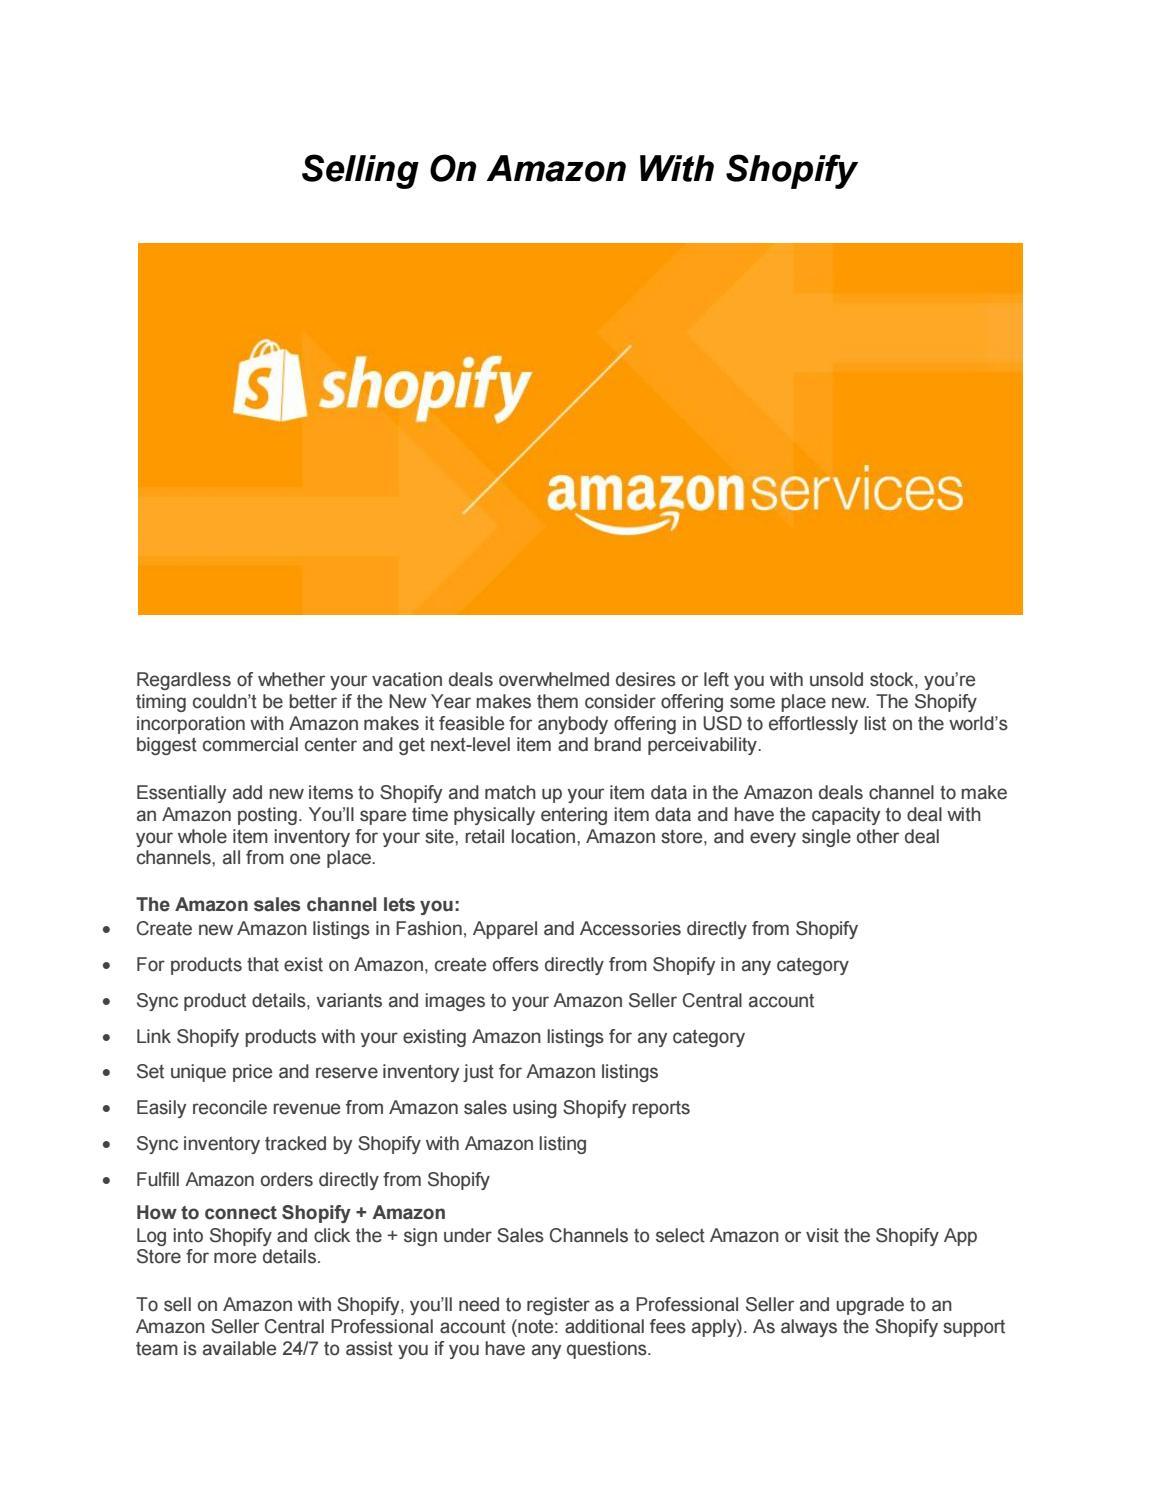 amazon sales data images